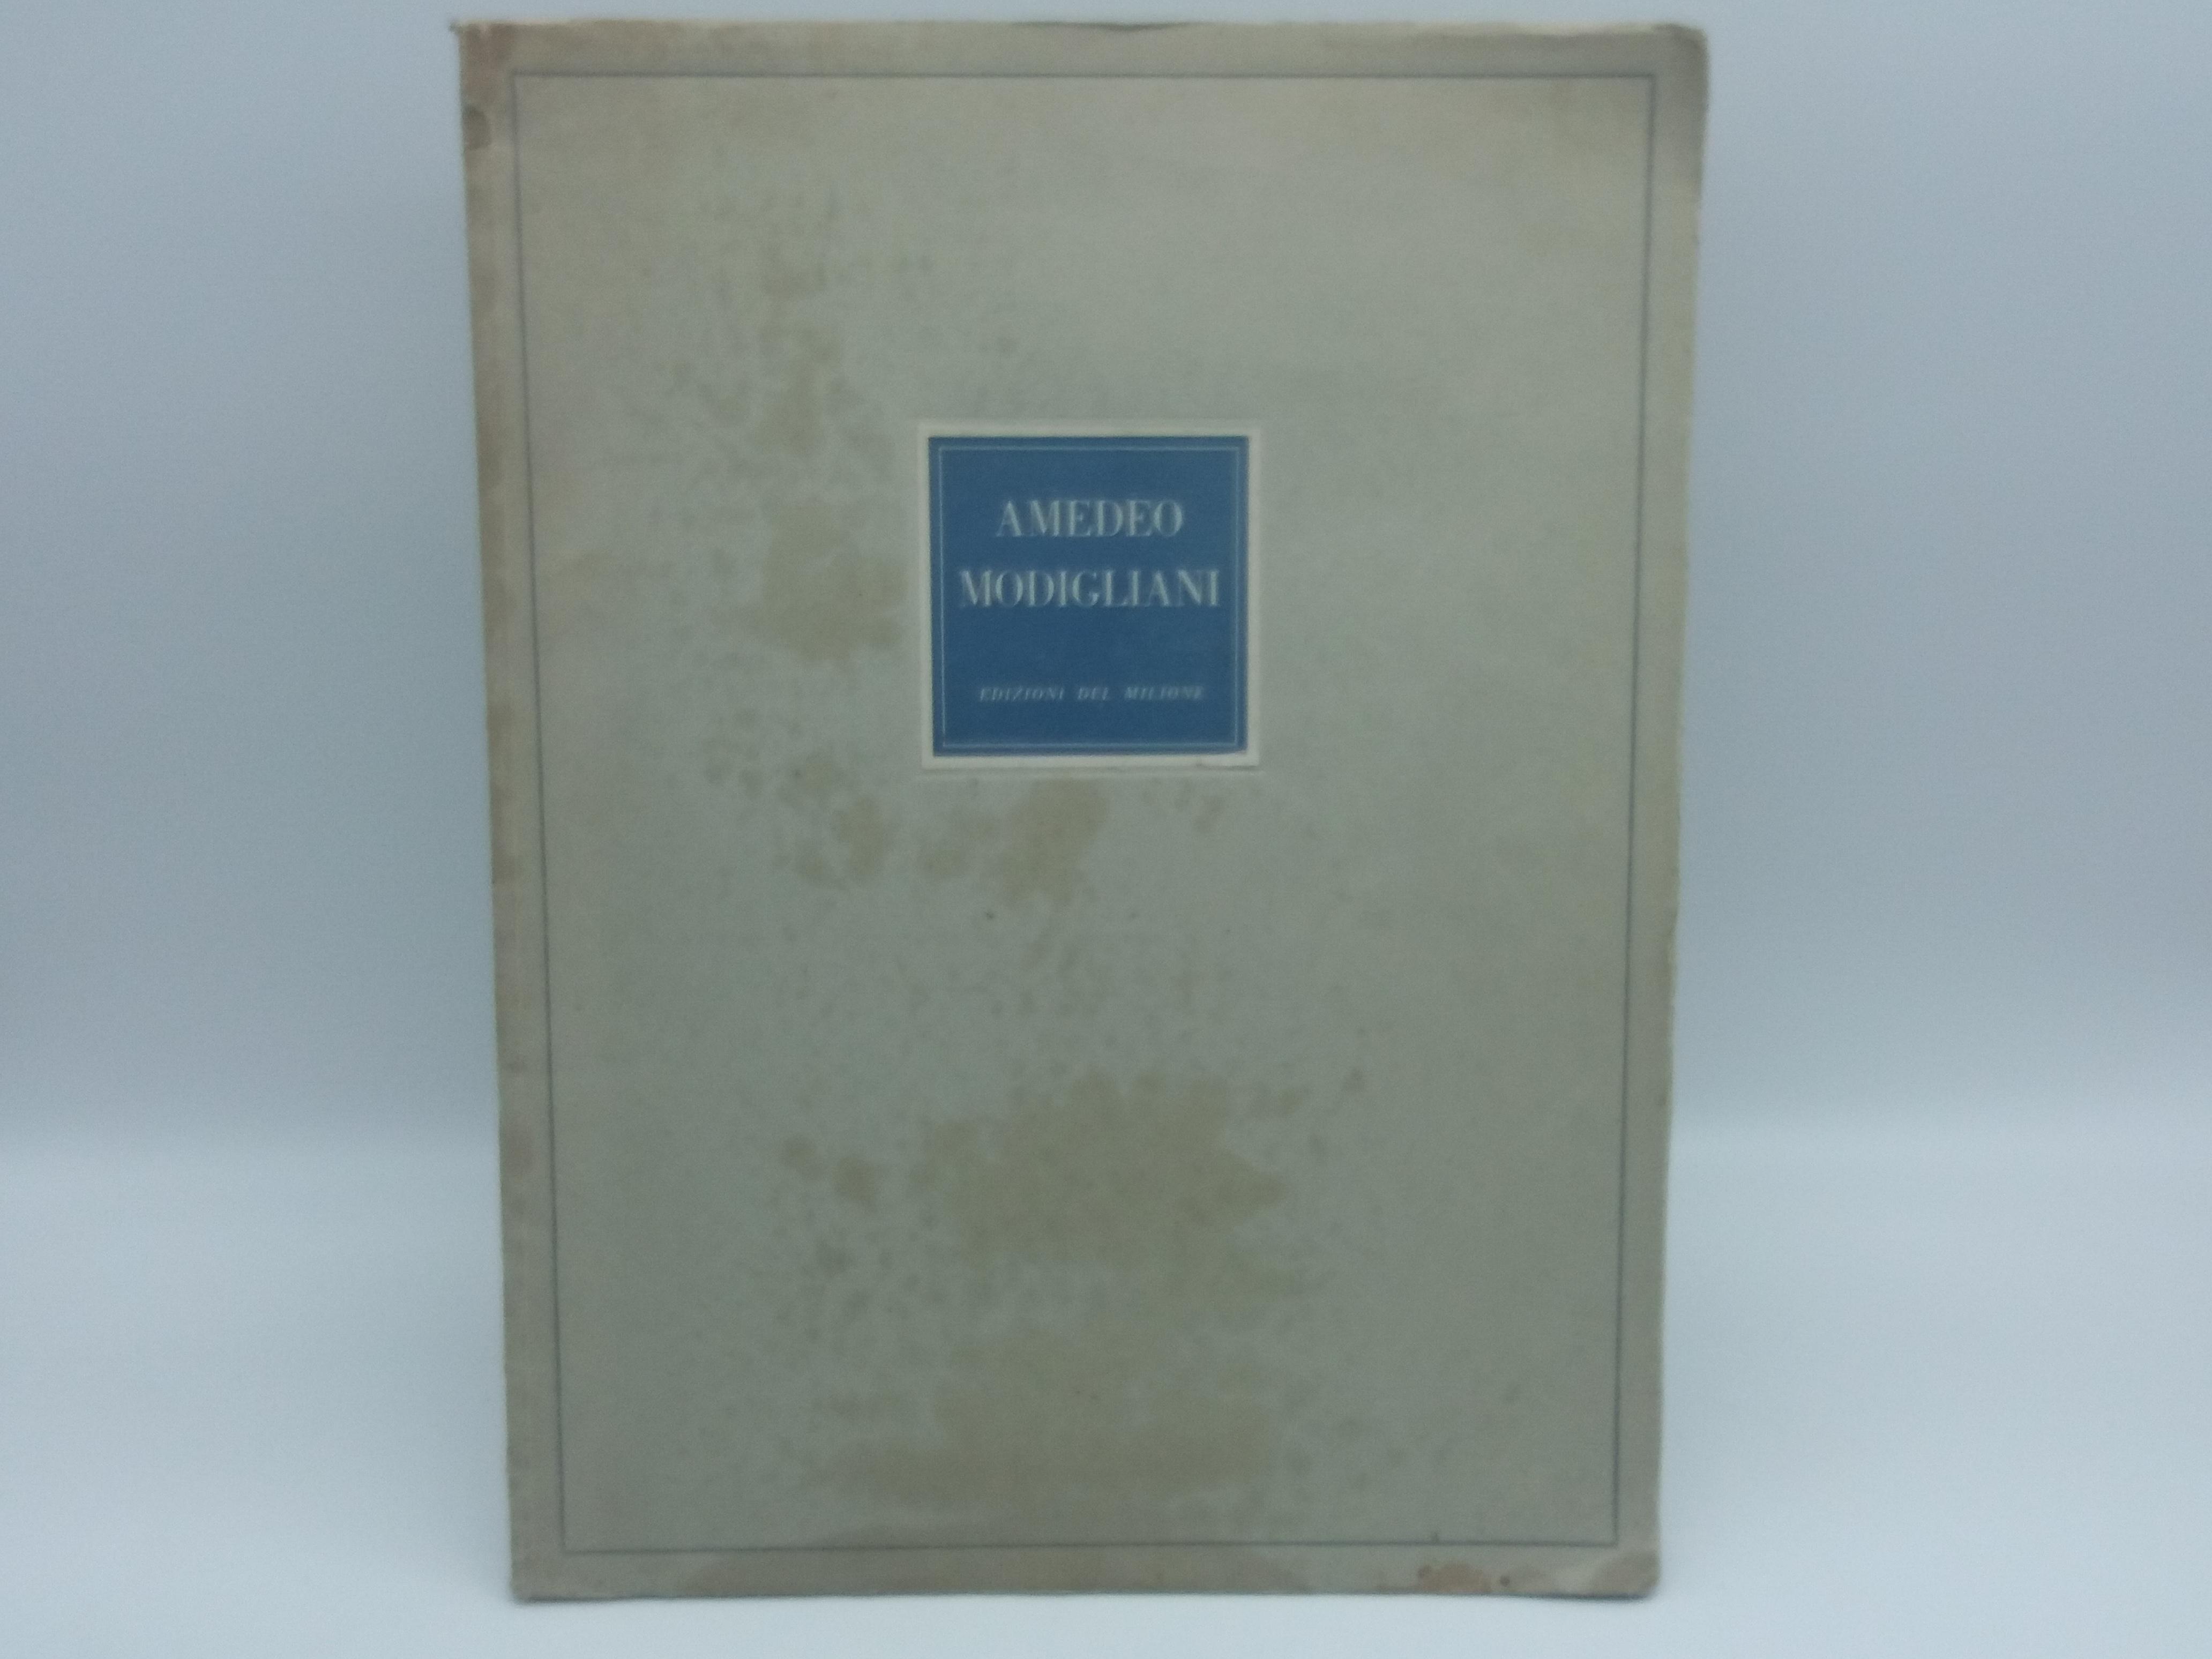 12 opere di Amedeo Modigliani